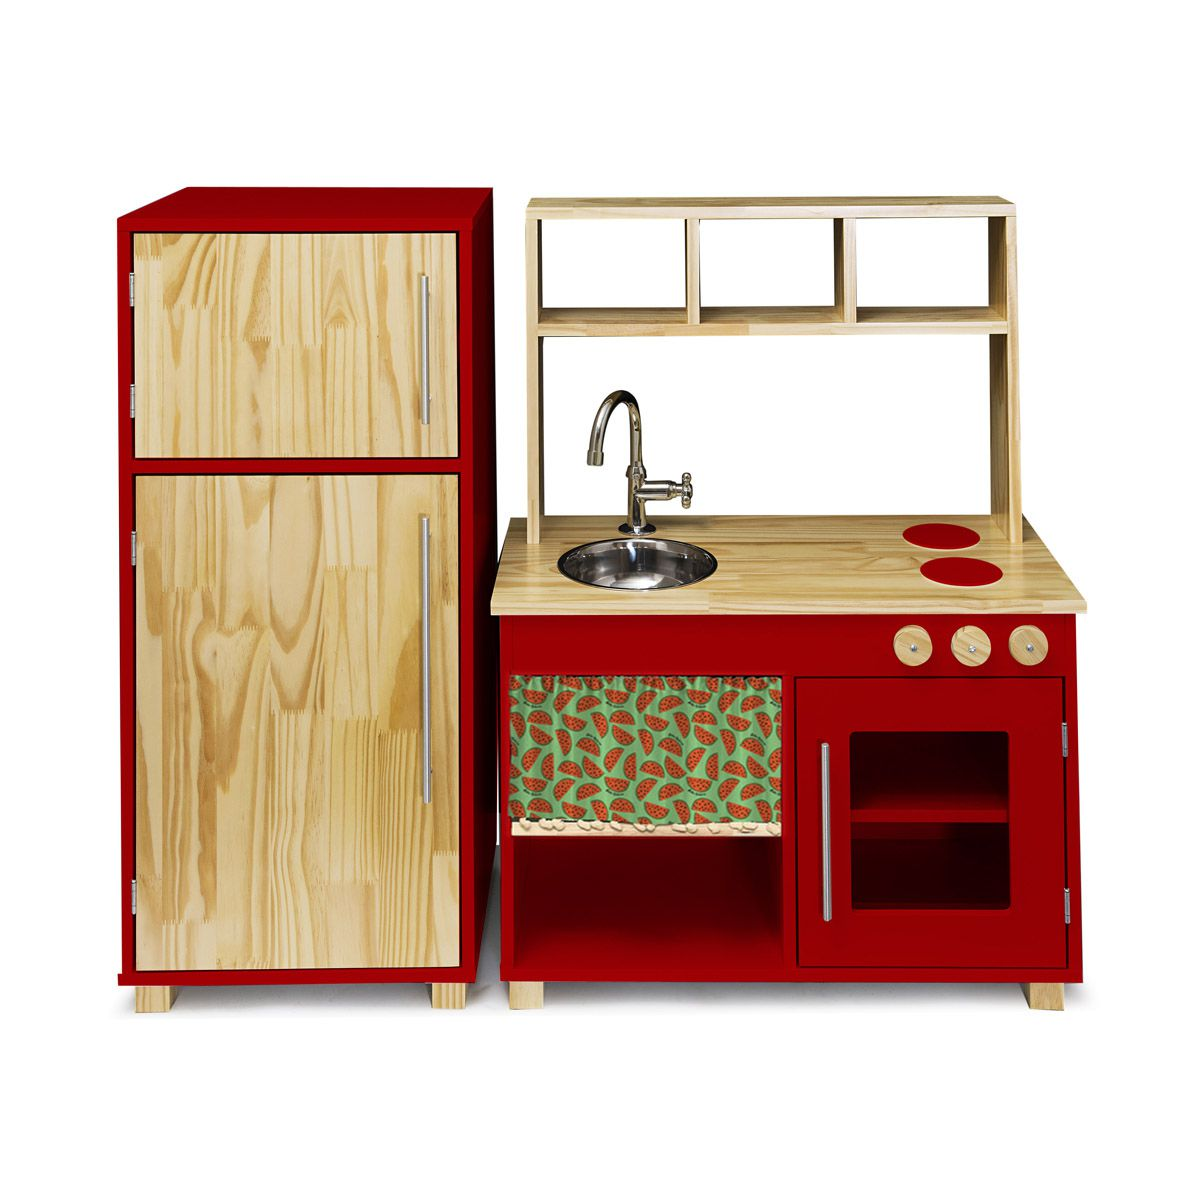 Cozinha Compacta Yara